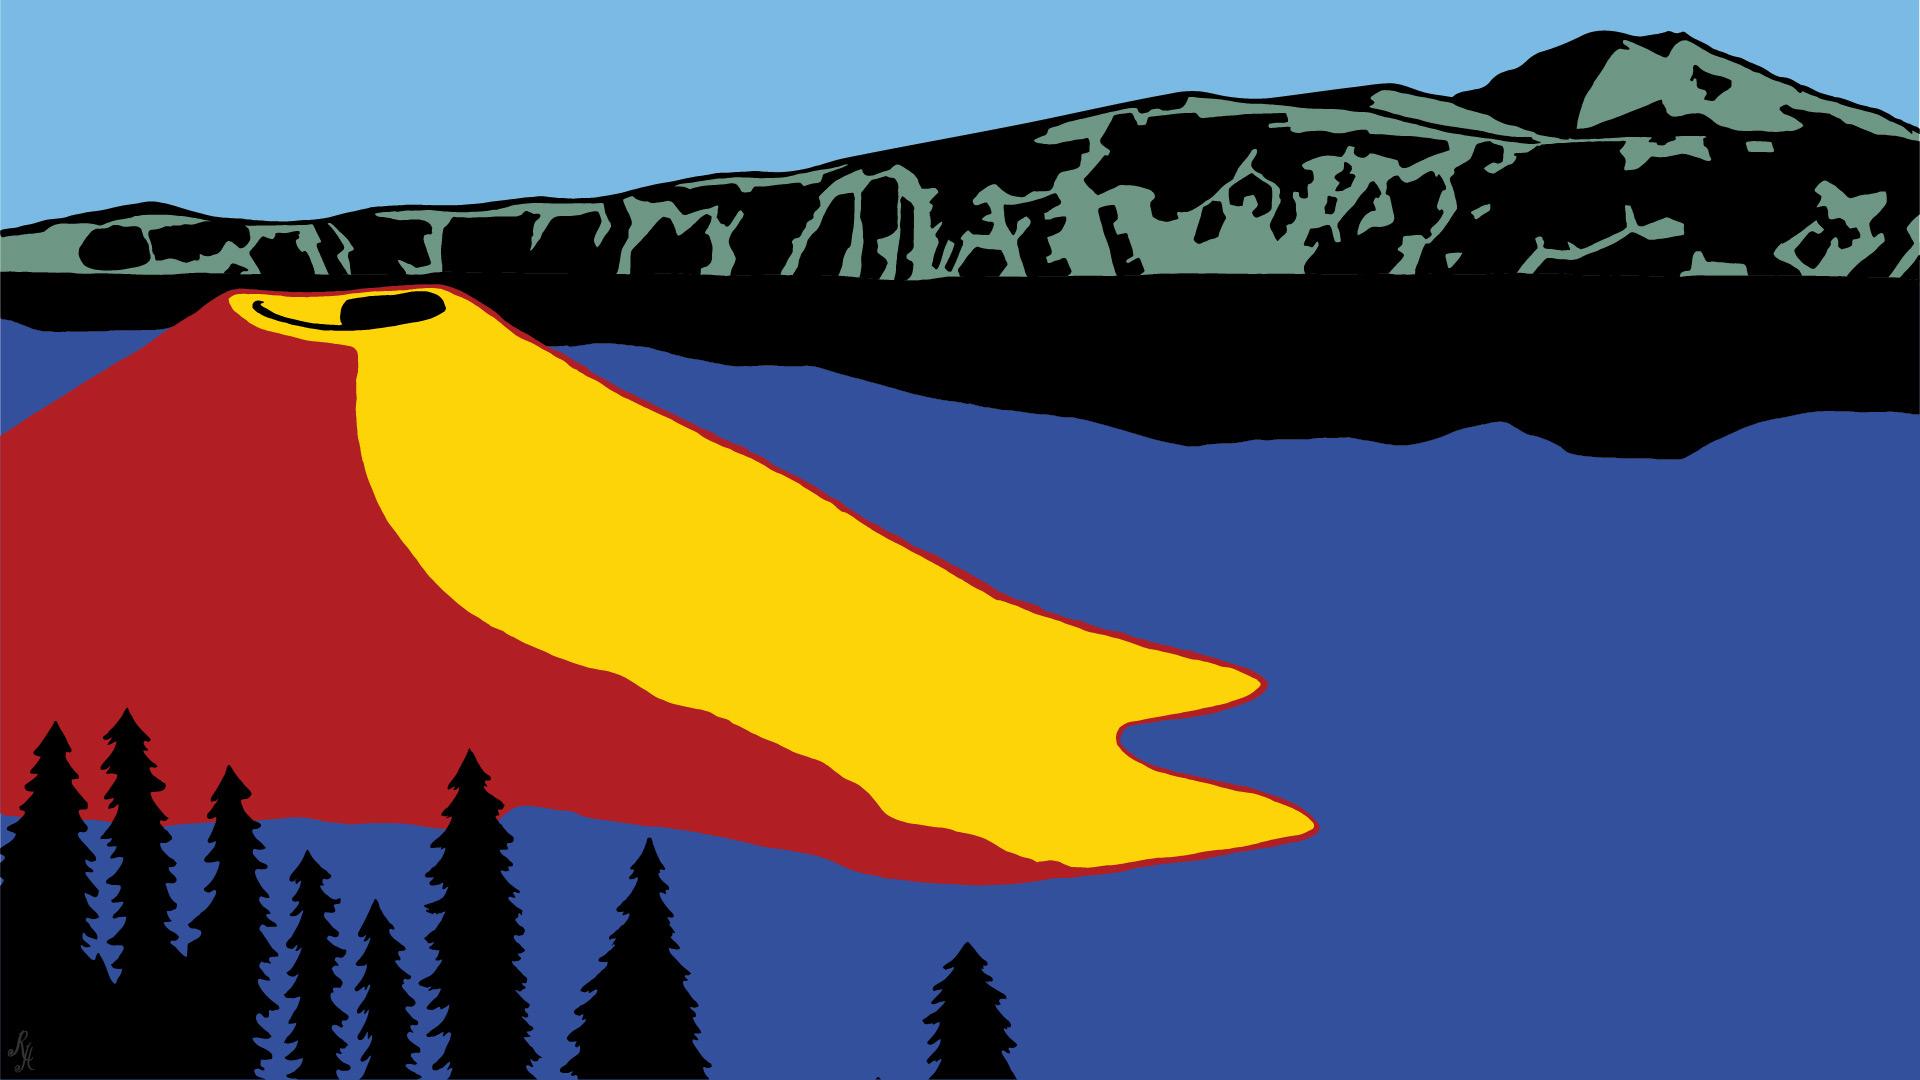 Crater Lake Illustration by Roberta Hoffman